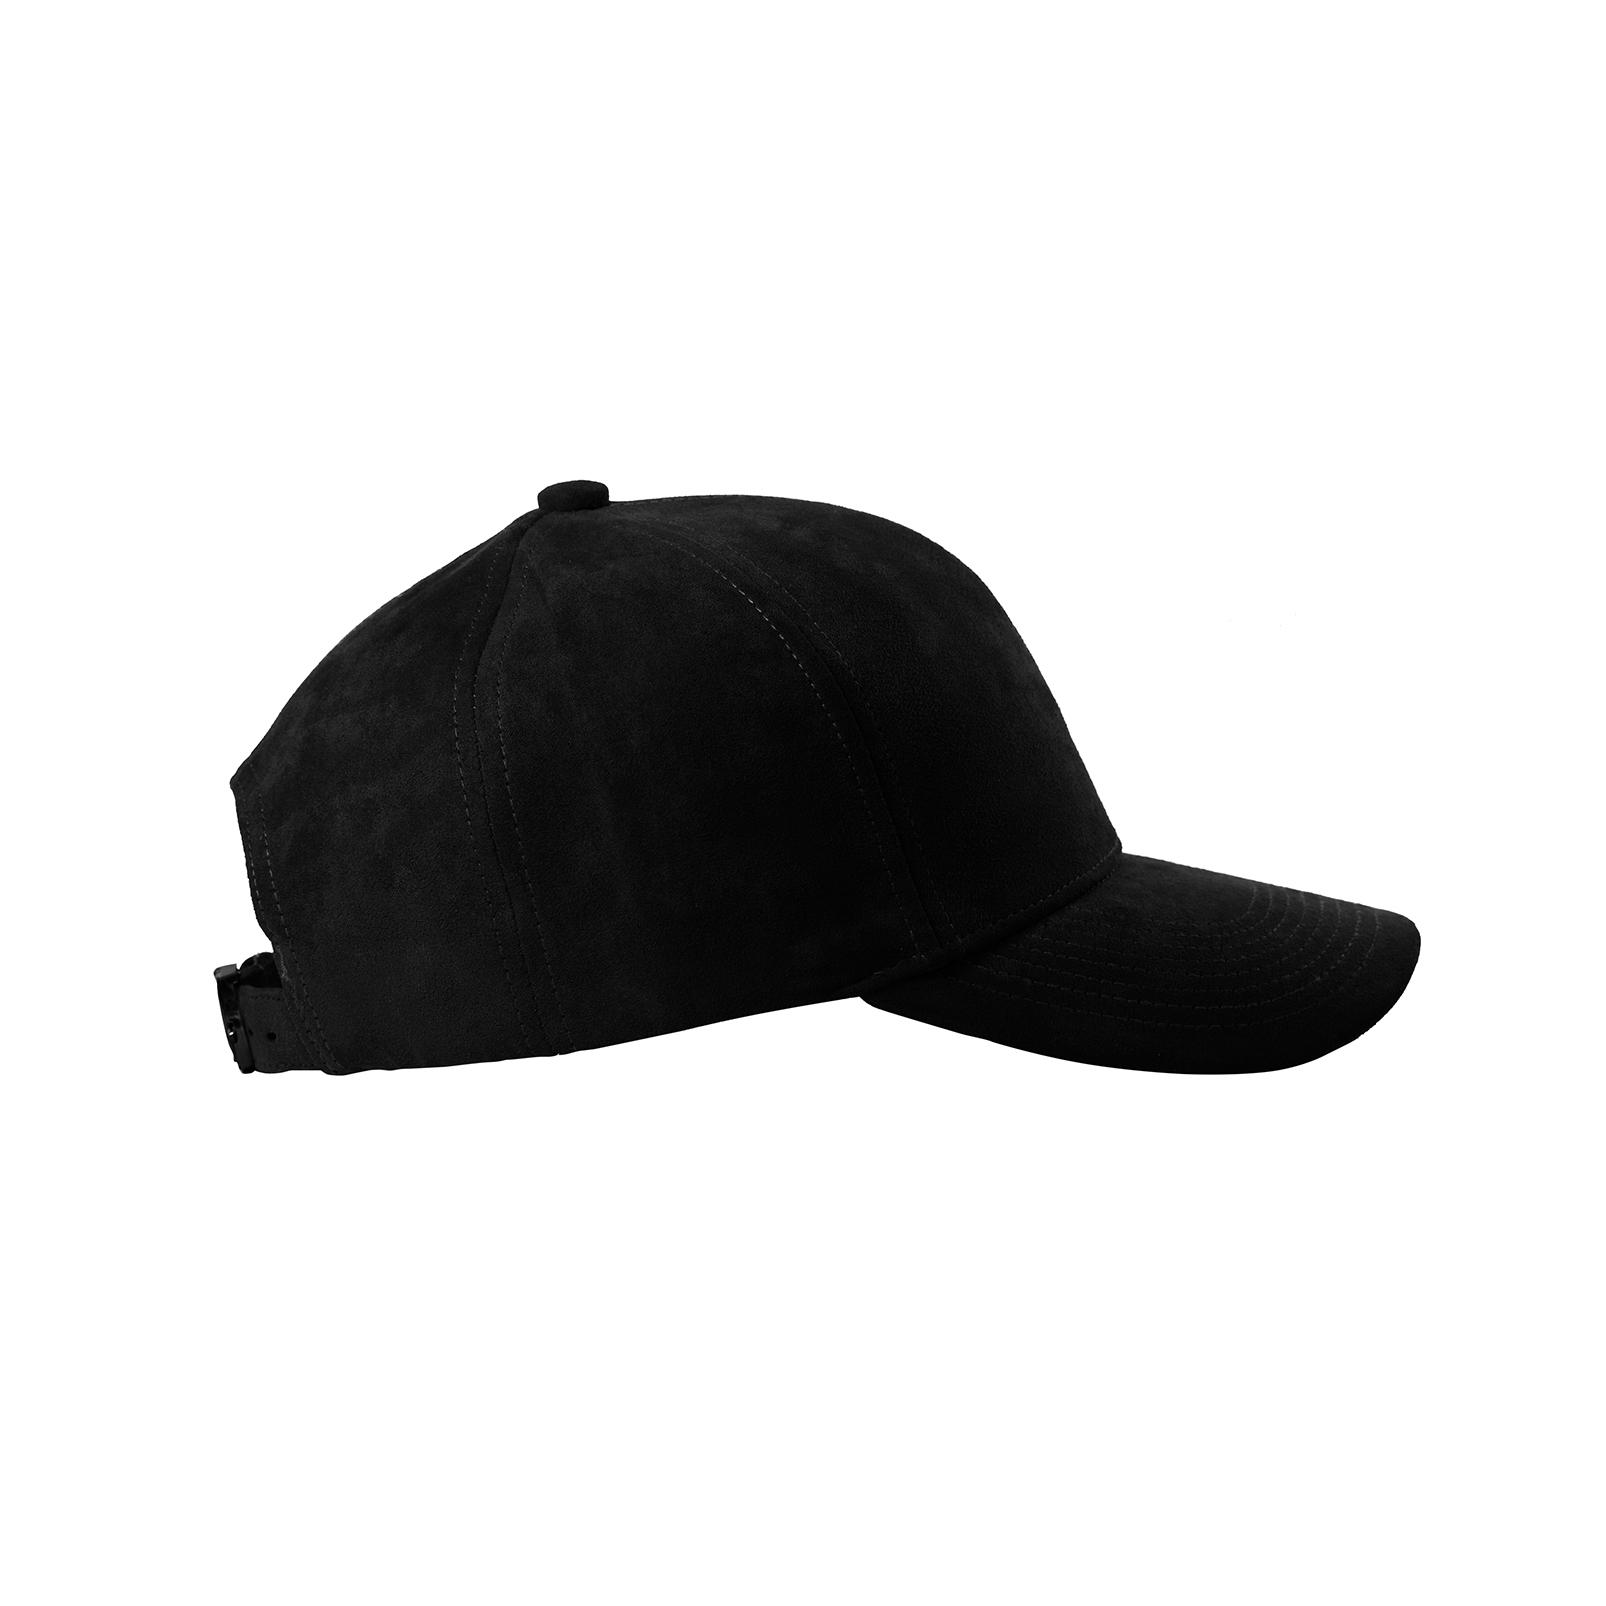 baseball-cap-black-suede-mat-black-side